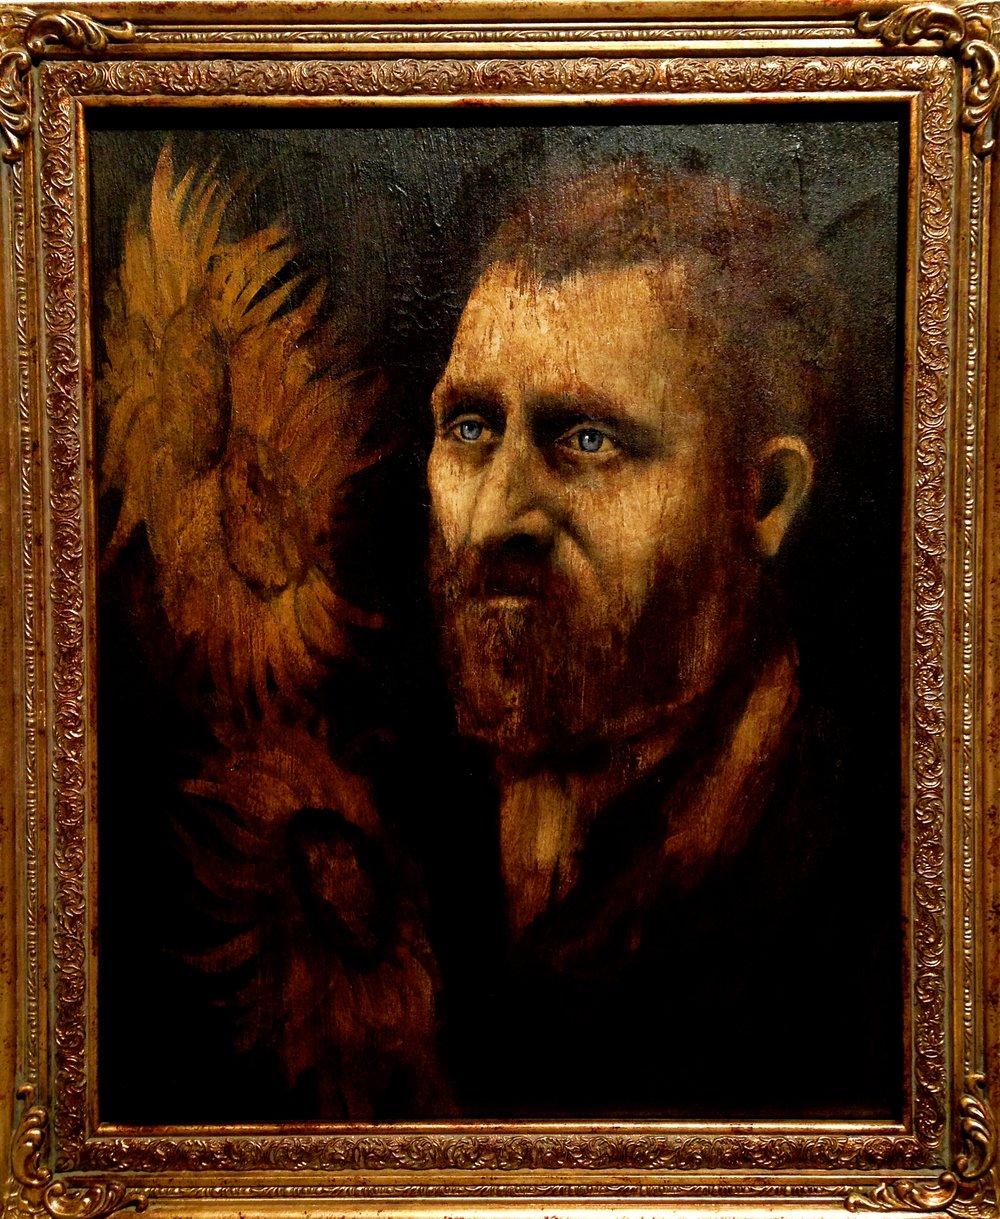 Van Gogh's Sanity, 2016 Acrylic & texture medium on canvas